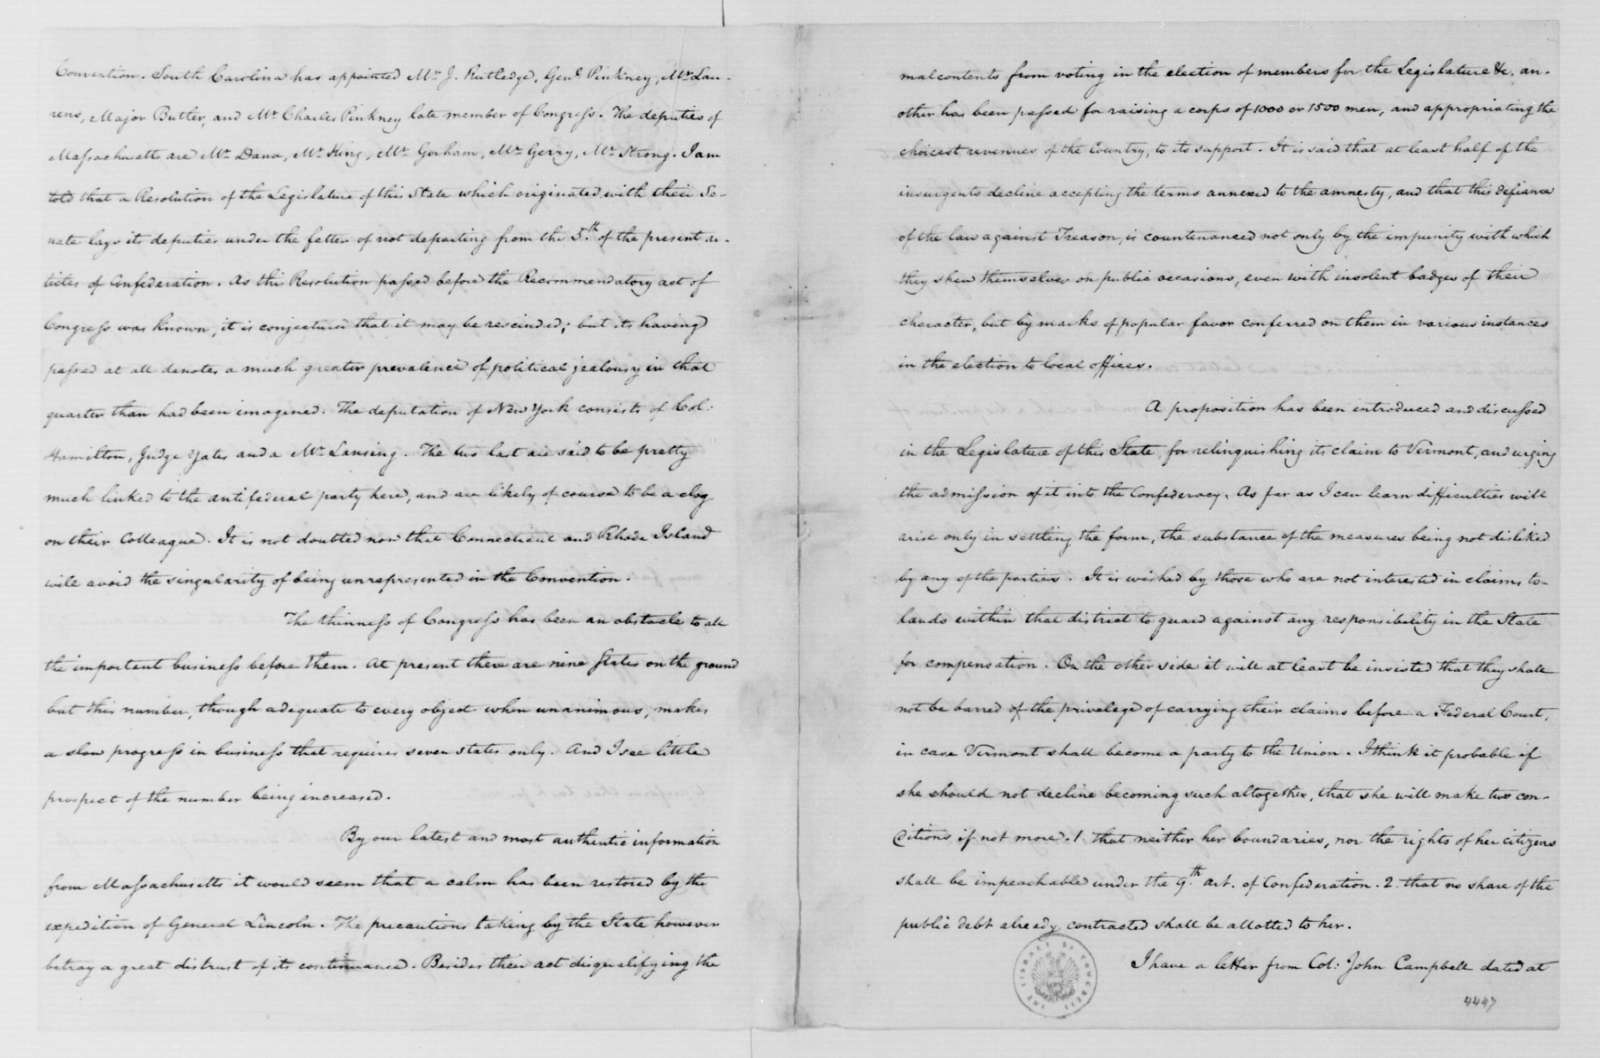 James Madison to George Washington, March 18, 1787.